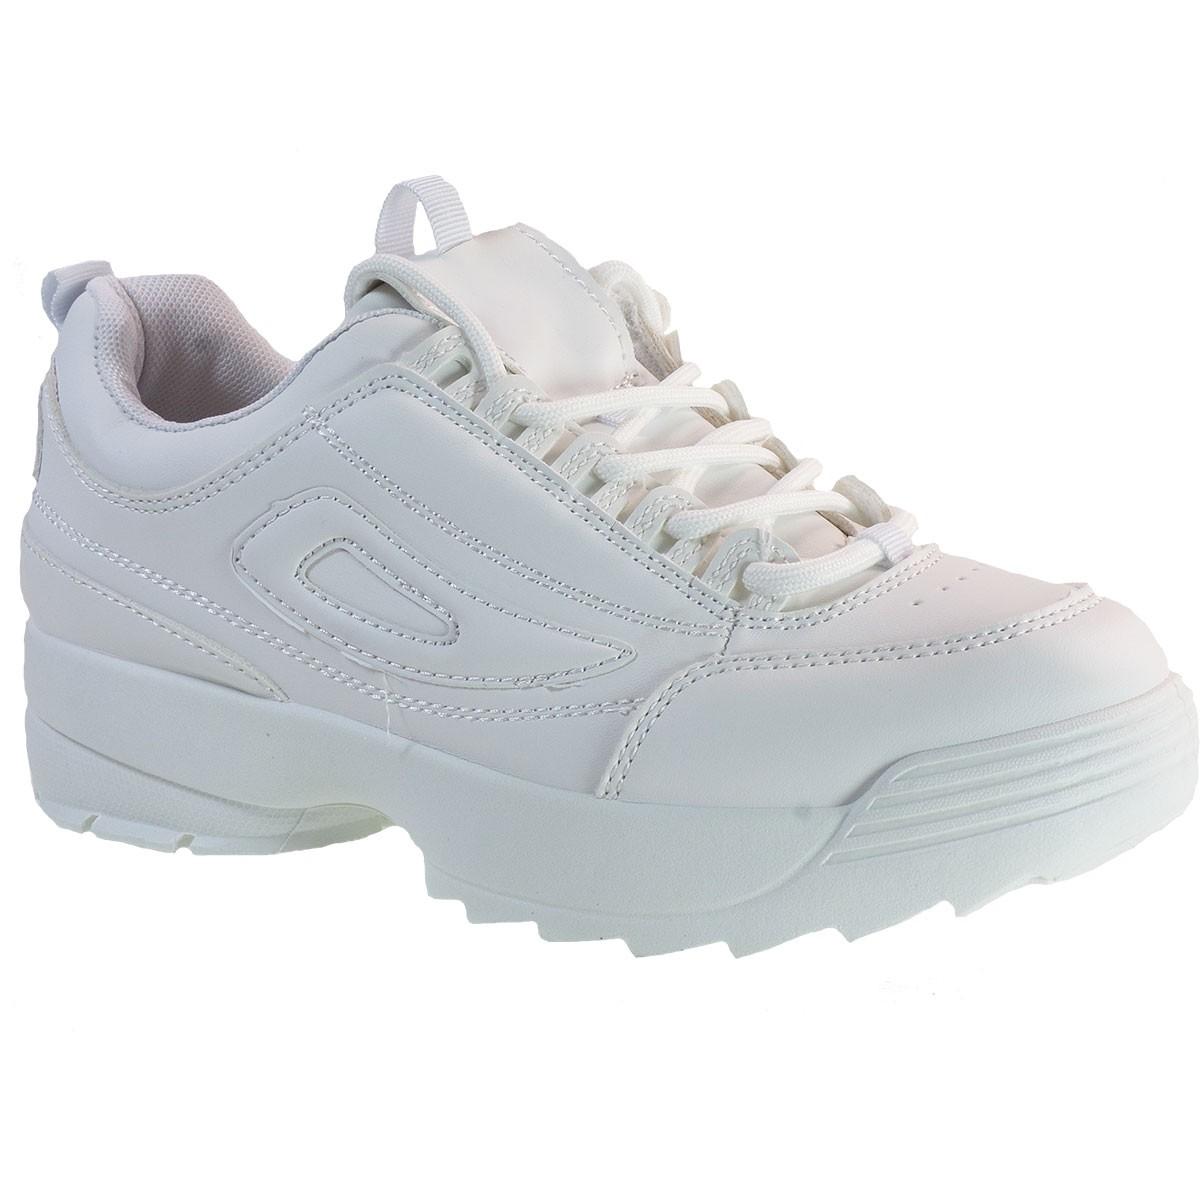 Bagiota Shoes Γυναικεία Παπούτσια Sneakers Αθλητικά C8385 Λευκό